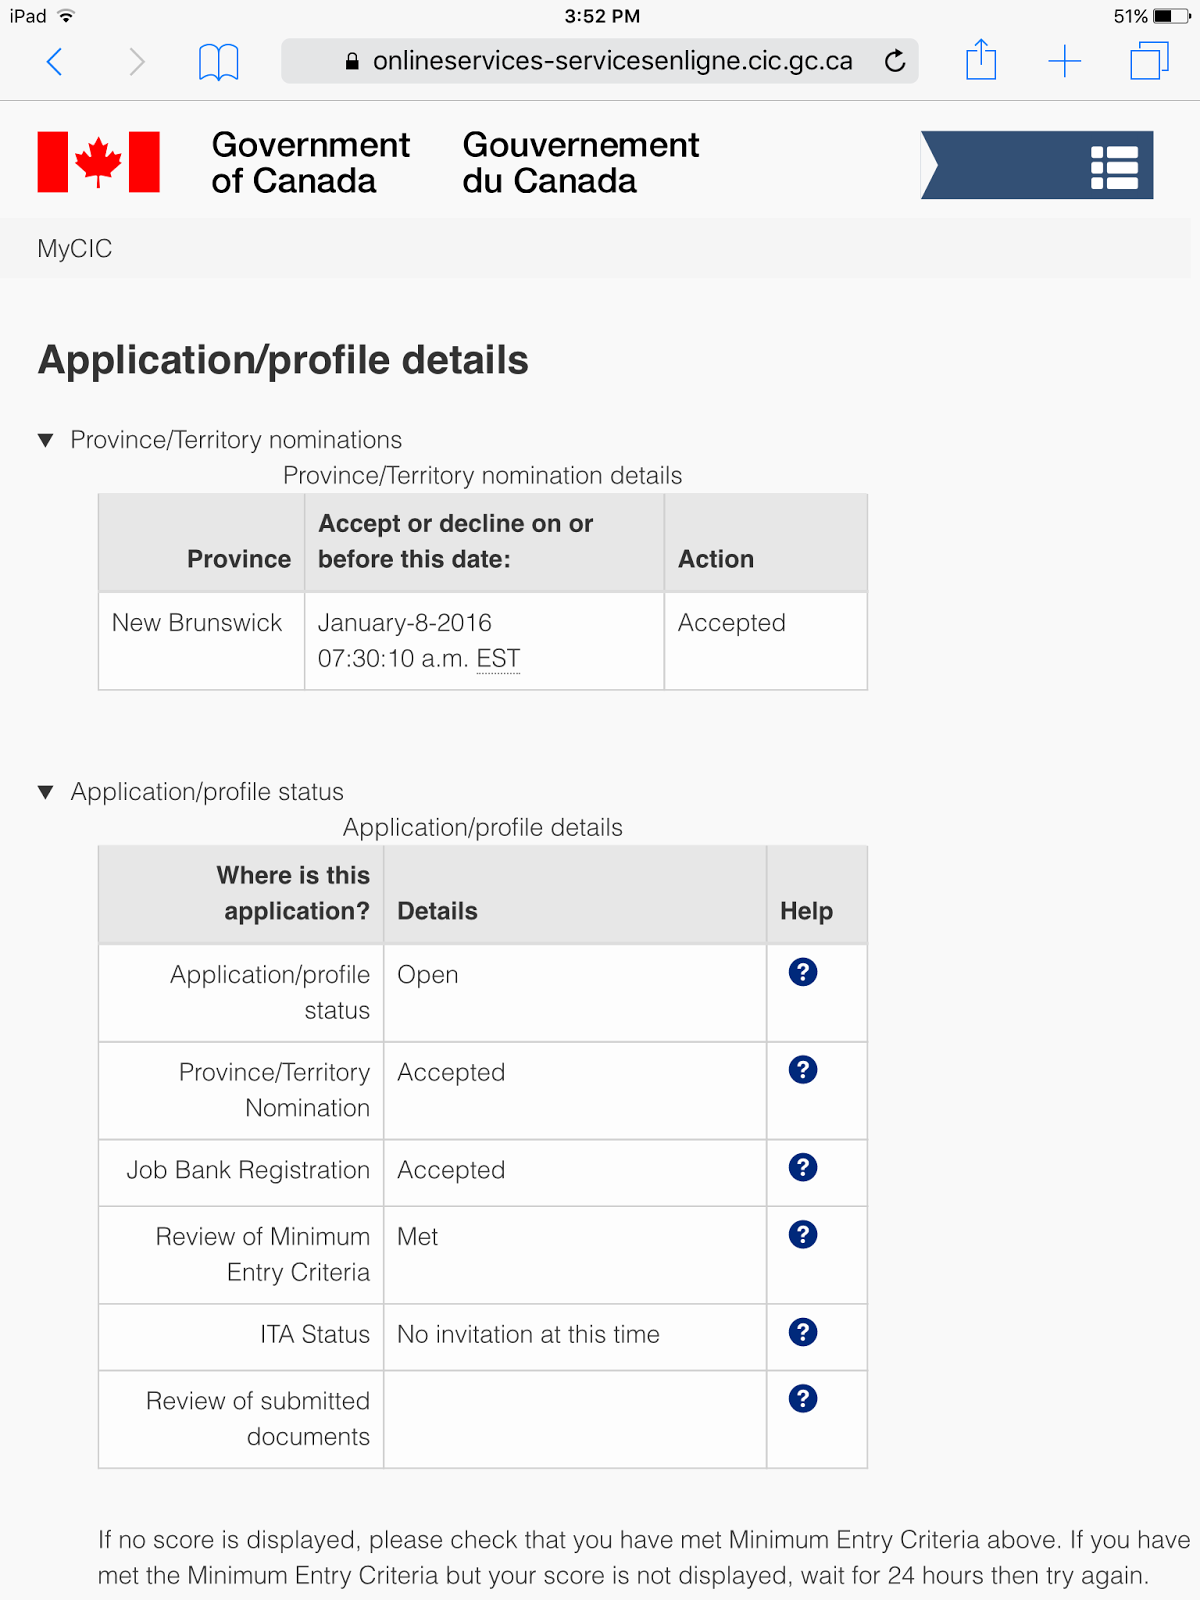 do your partner needs ielts score for pr application